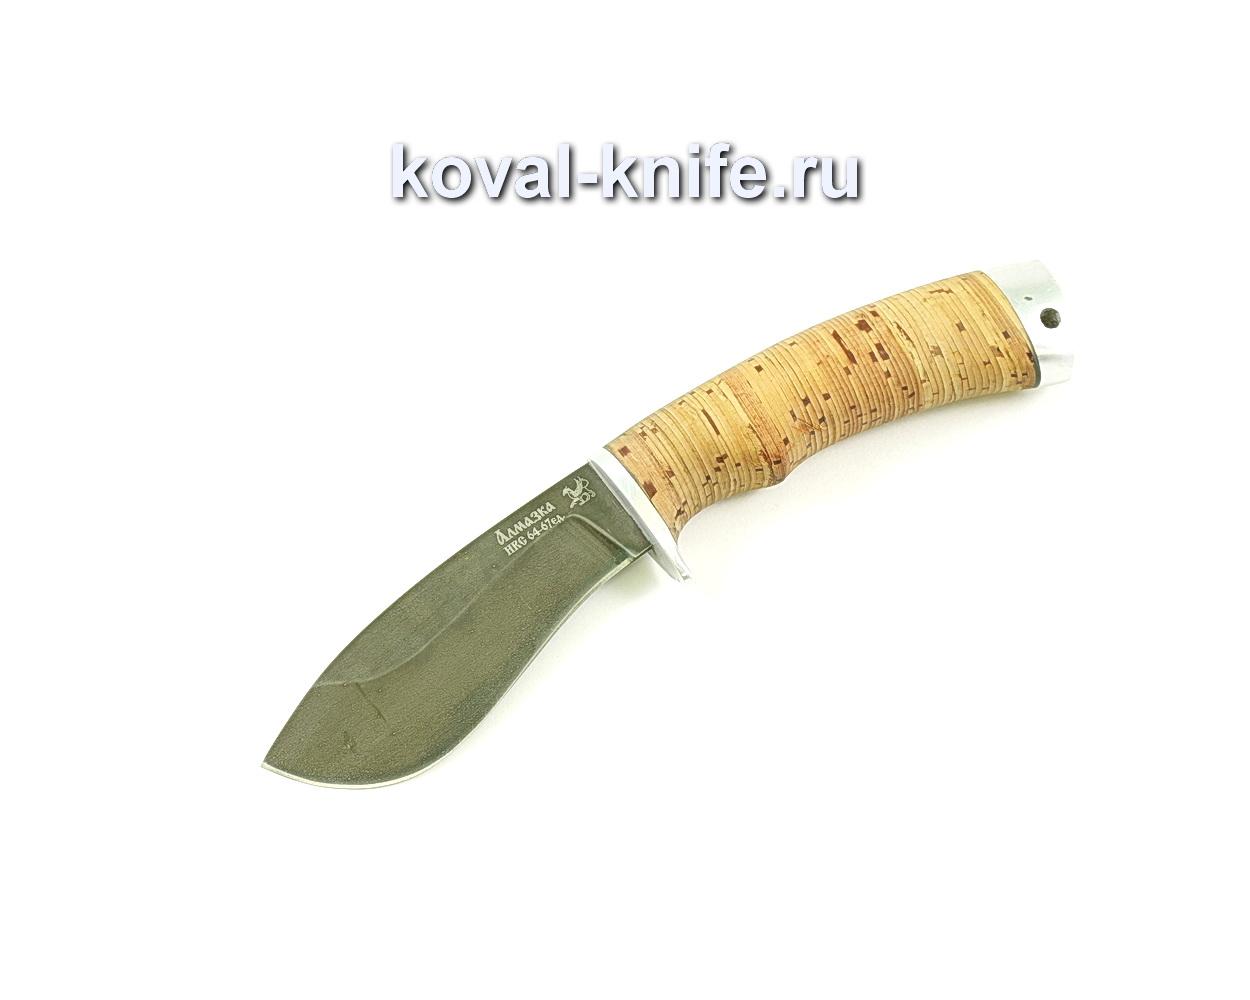 Нож Носорог (сталь ХВ5-Алмазка), рукоять береста A045